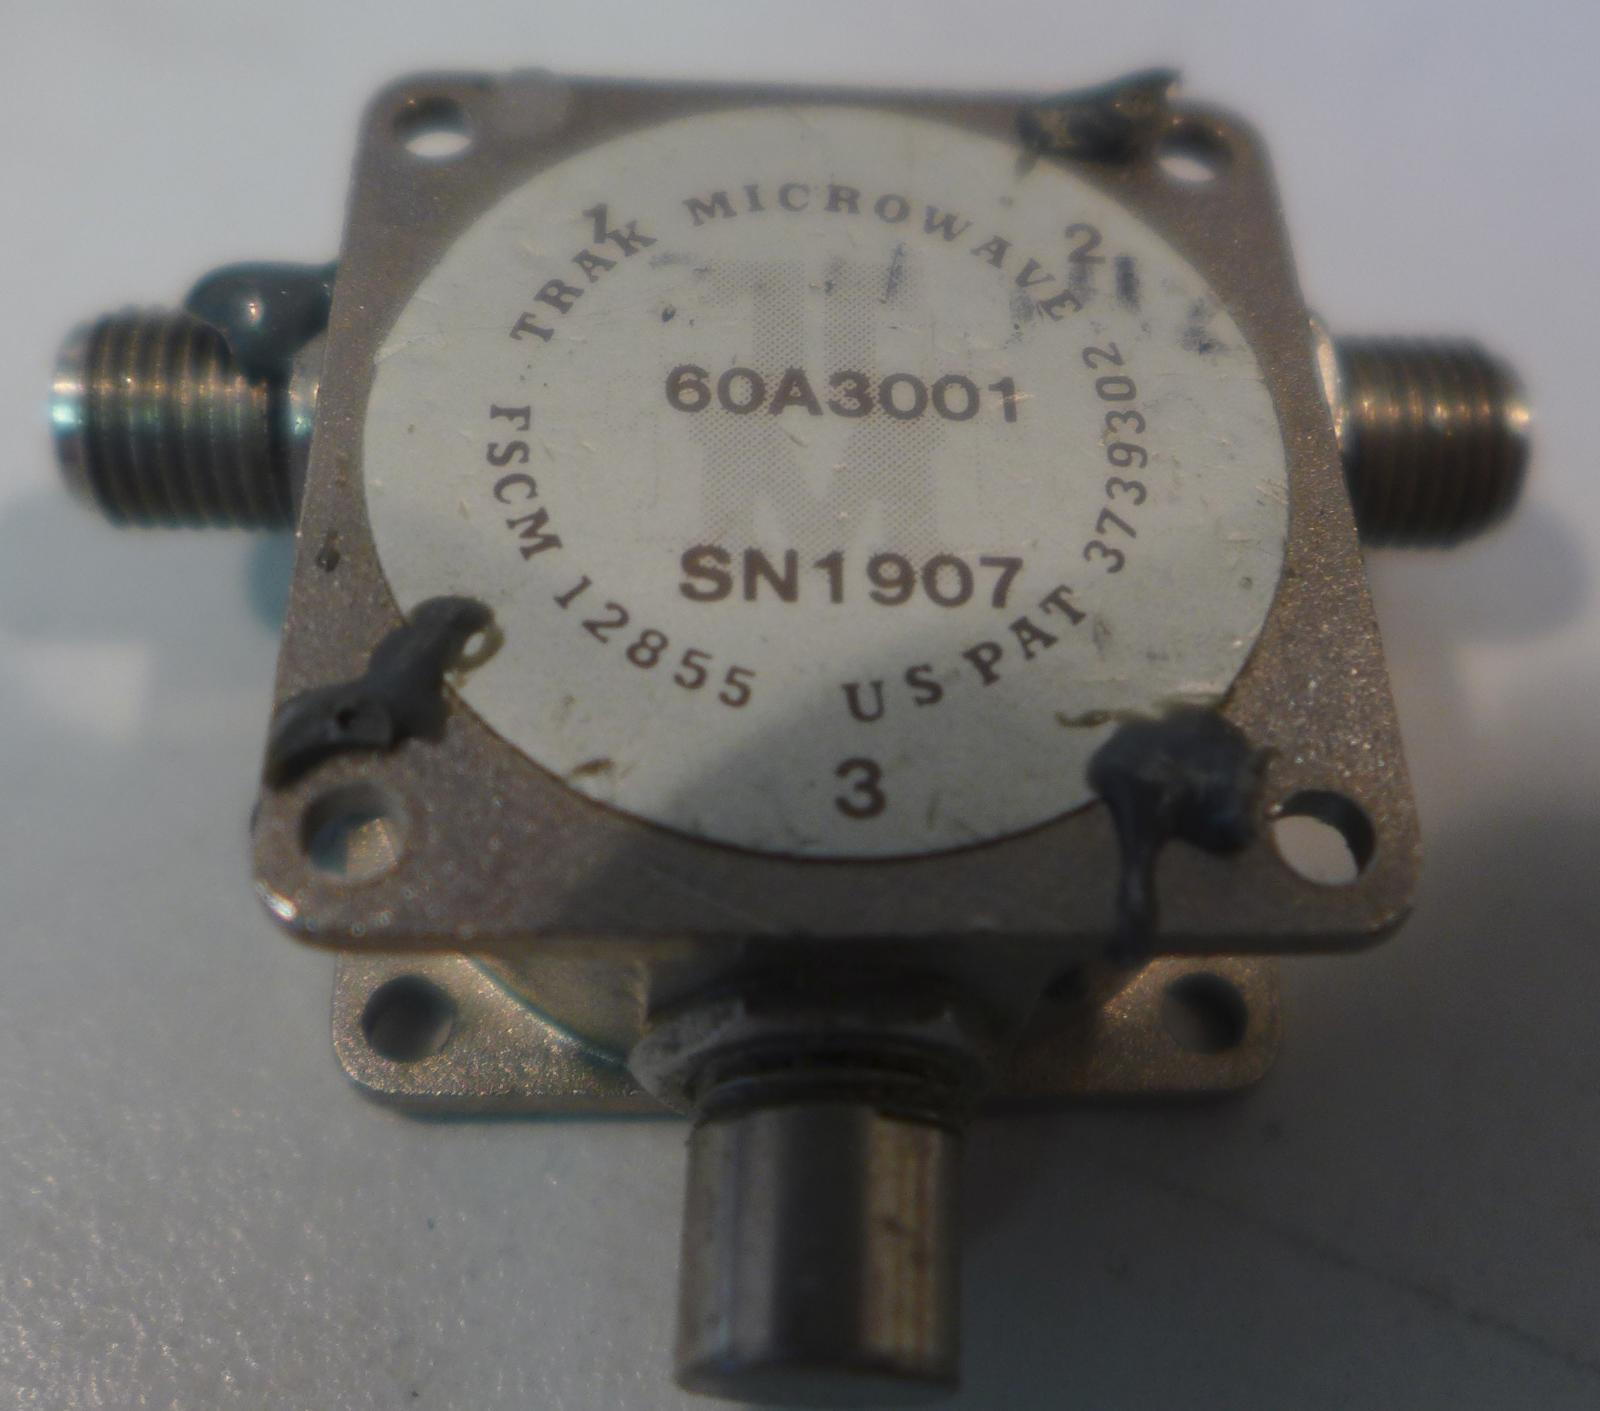 2.5-5.0 GHz TRAK MICROWAVE 60A3011 Isolator 18 dB